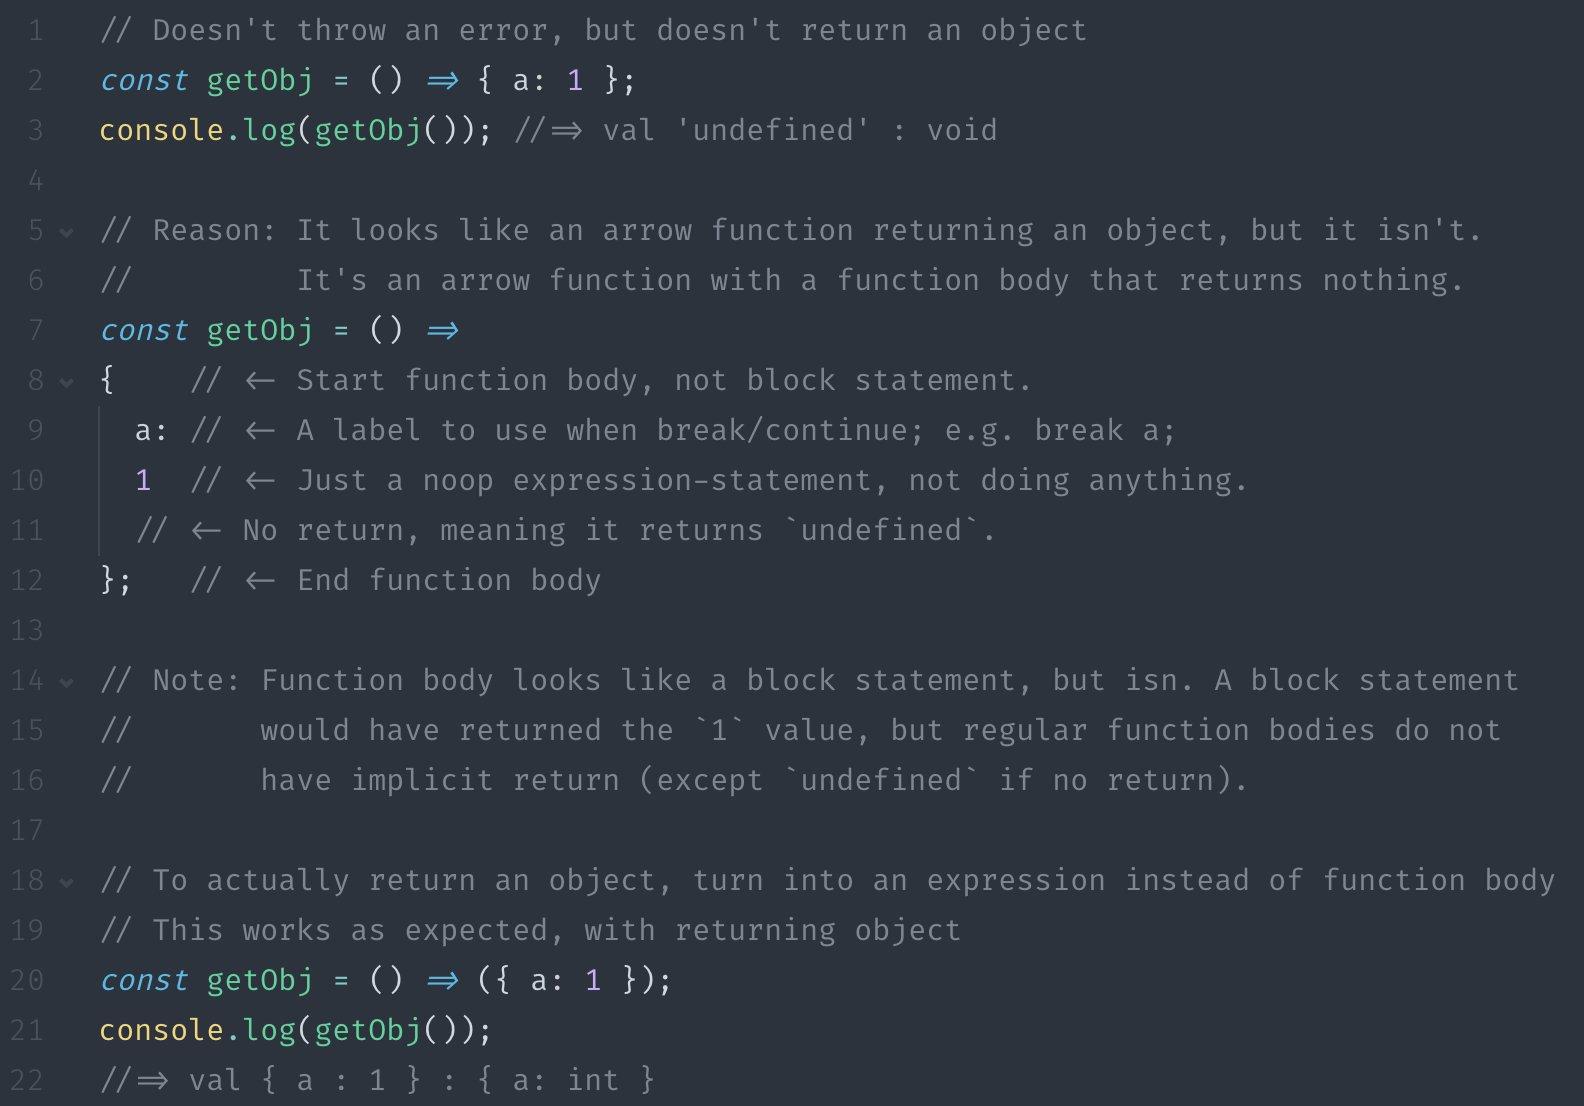 Free alternative to Operator Mono Italic Theme for VSCode